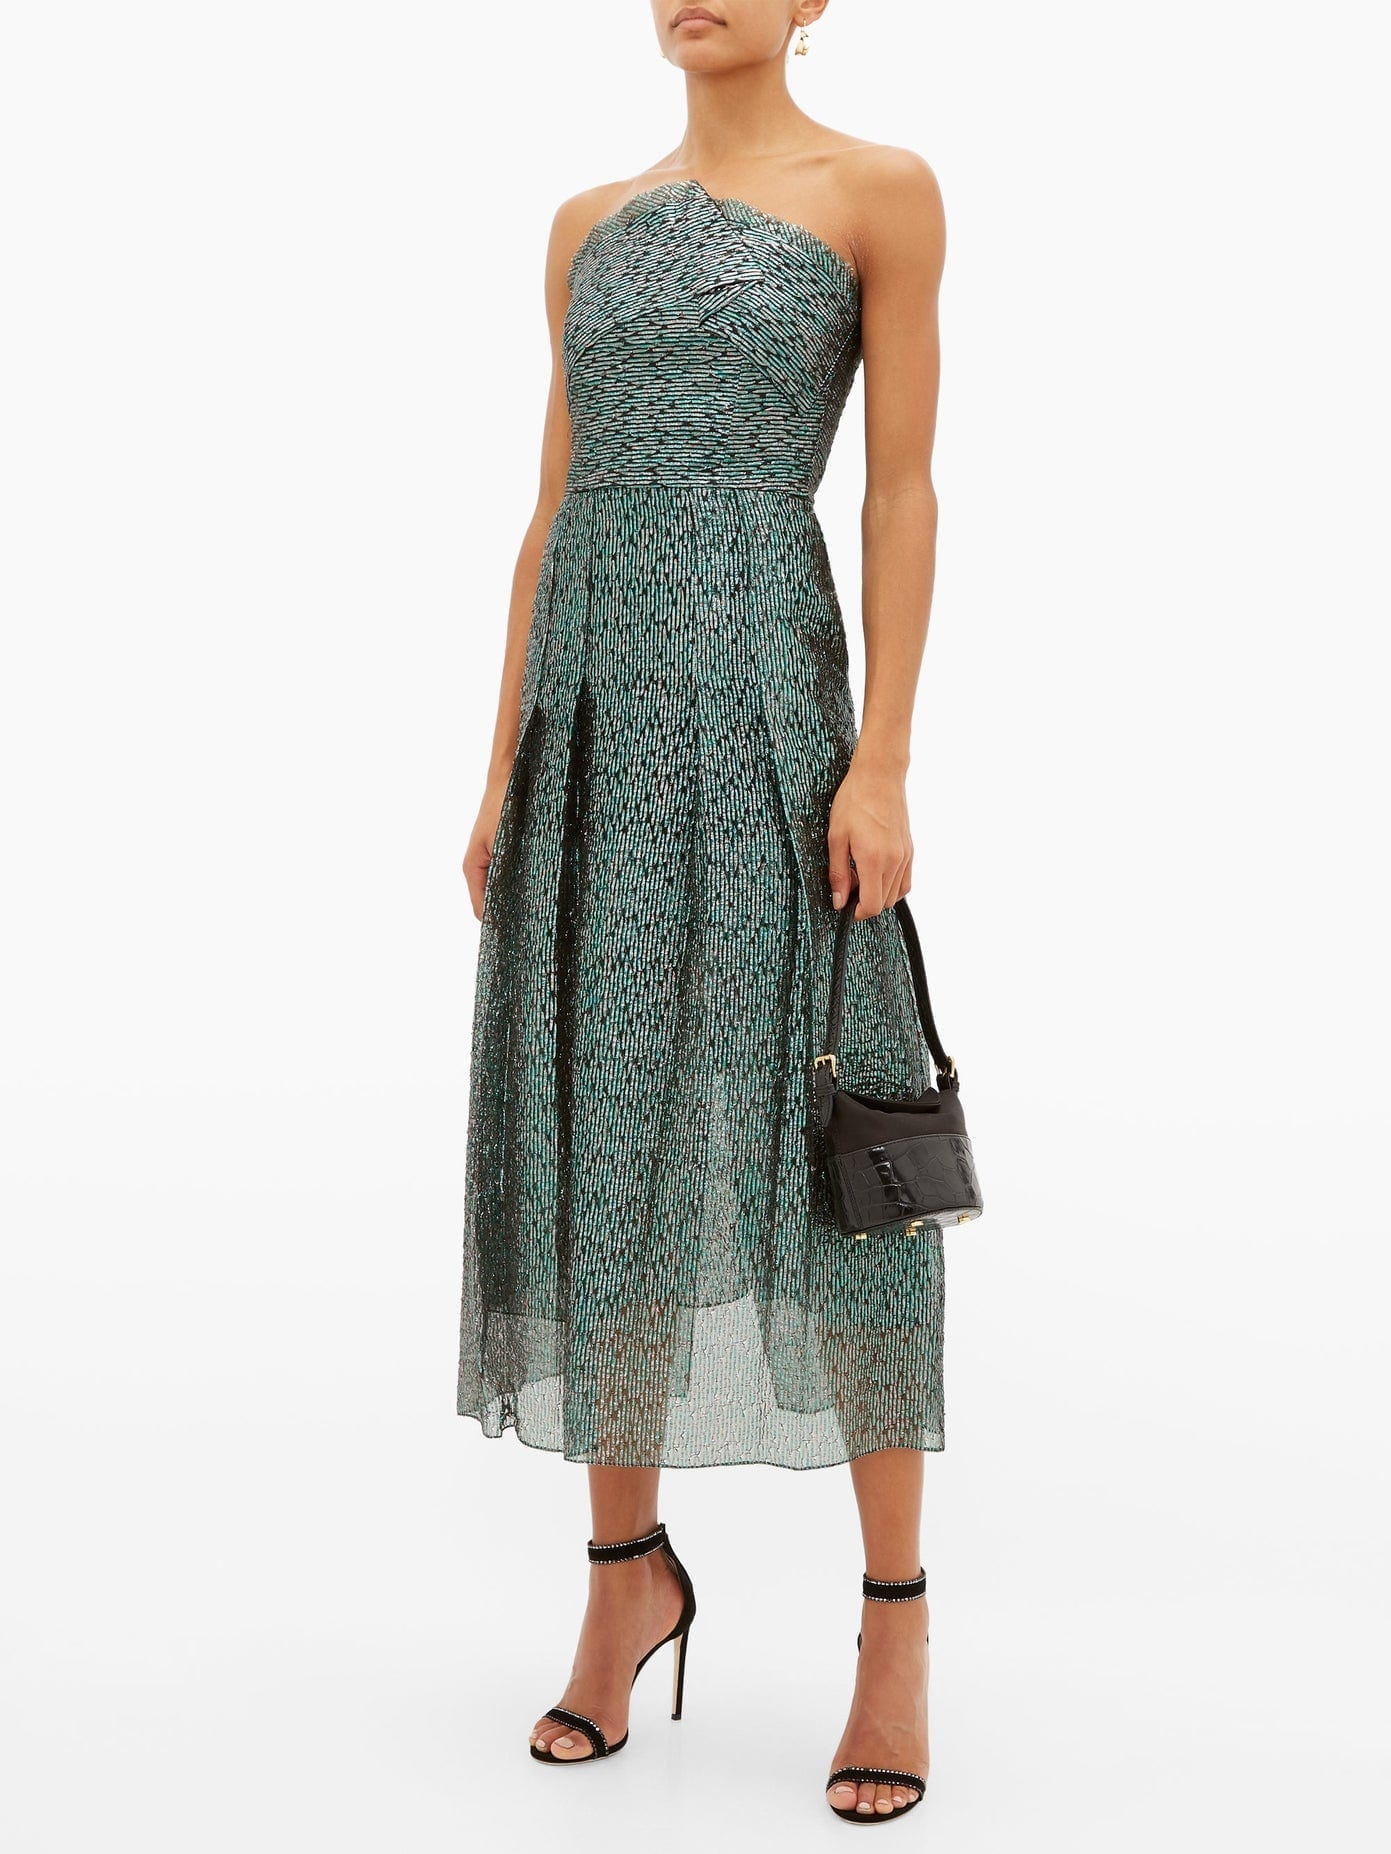 ROLAND MOURET Saranda Metallic Fil-coupé Pleated Dress